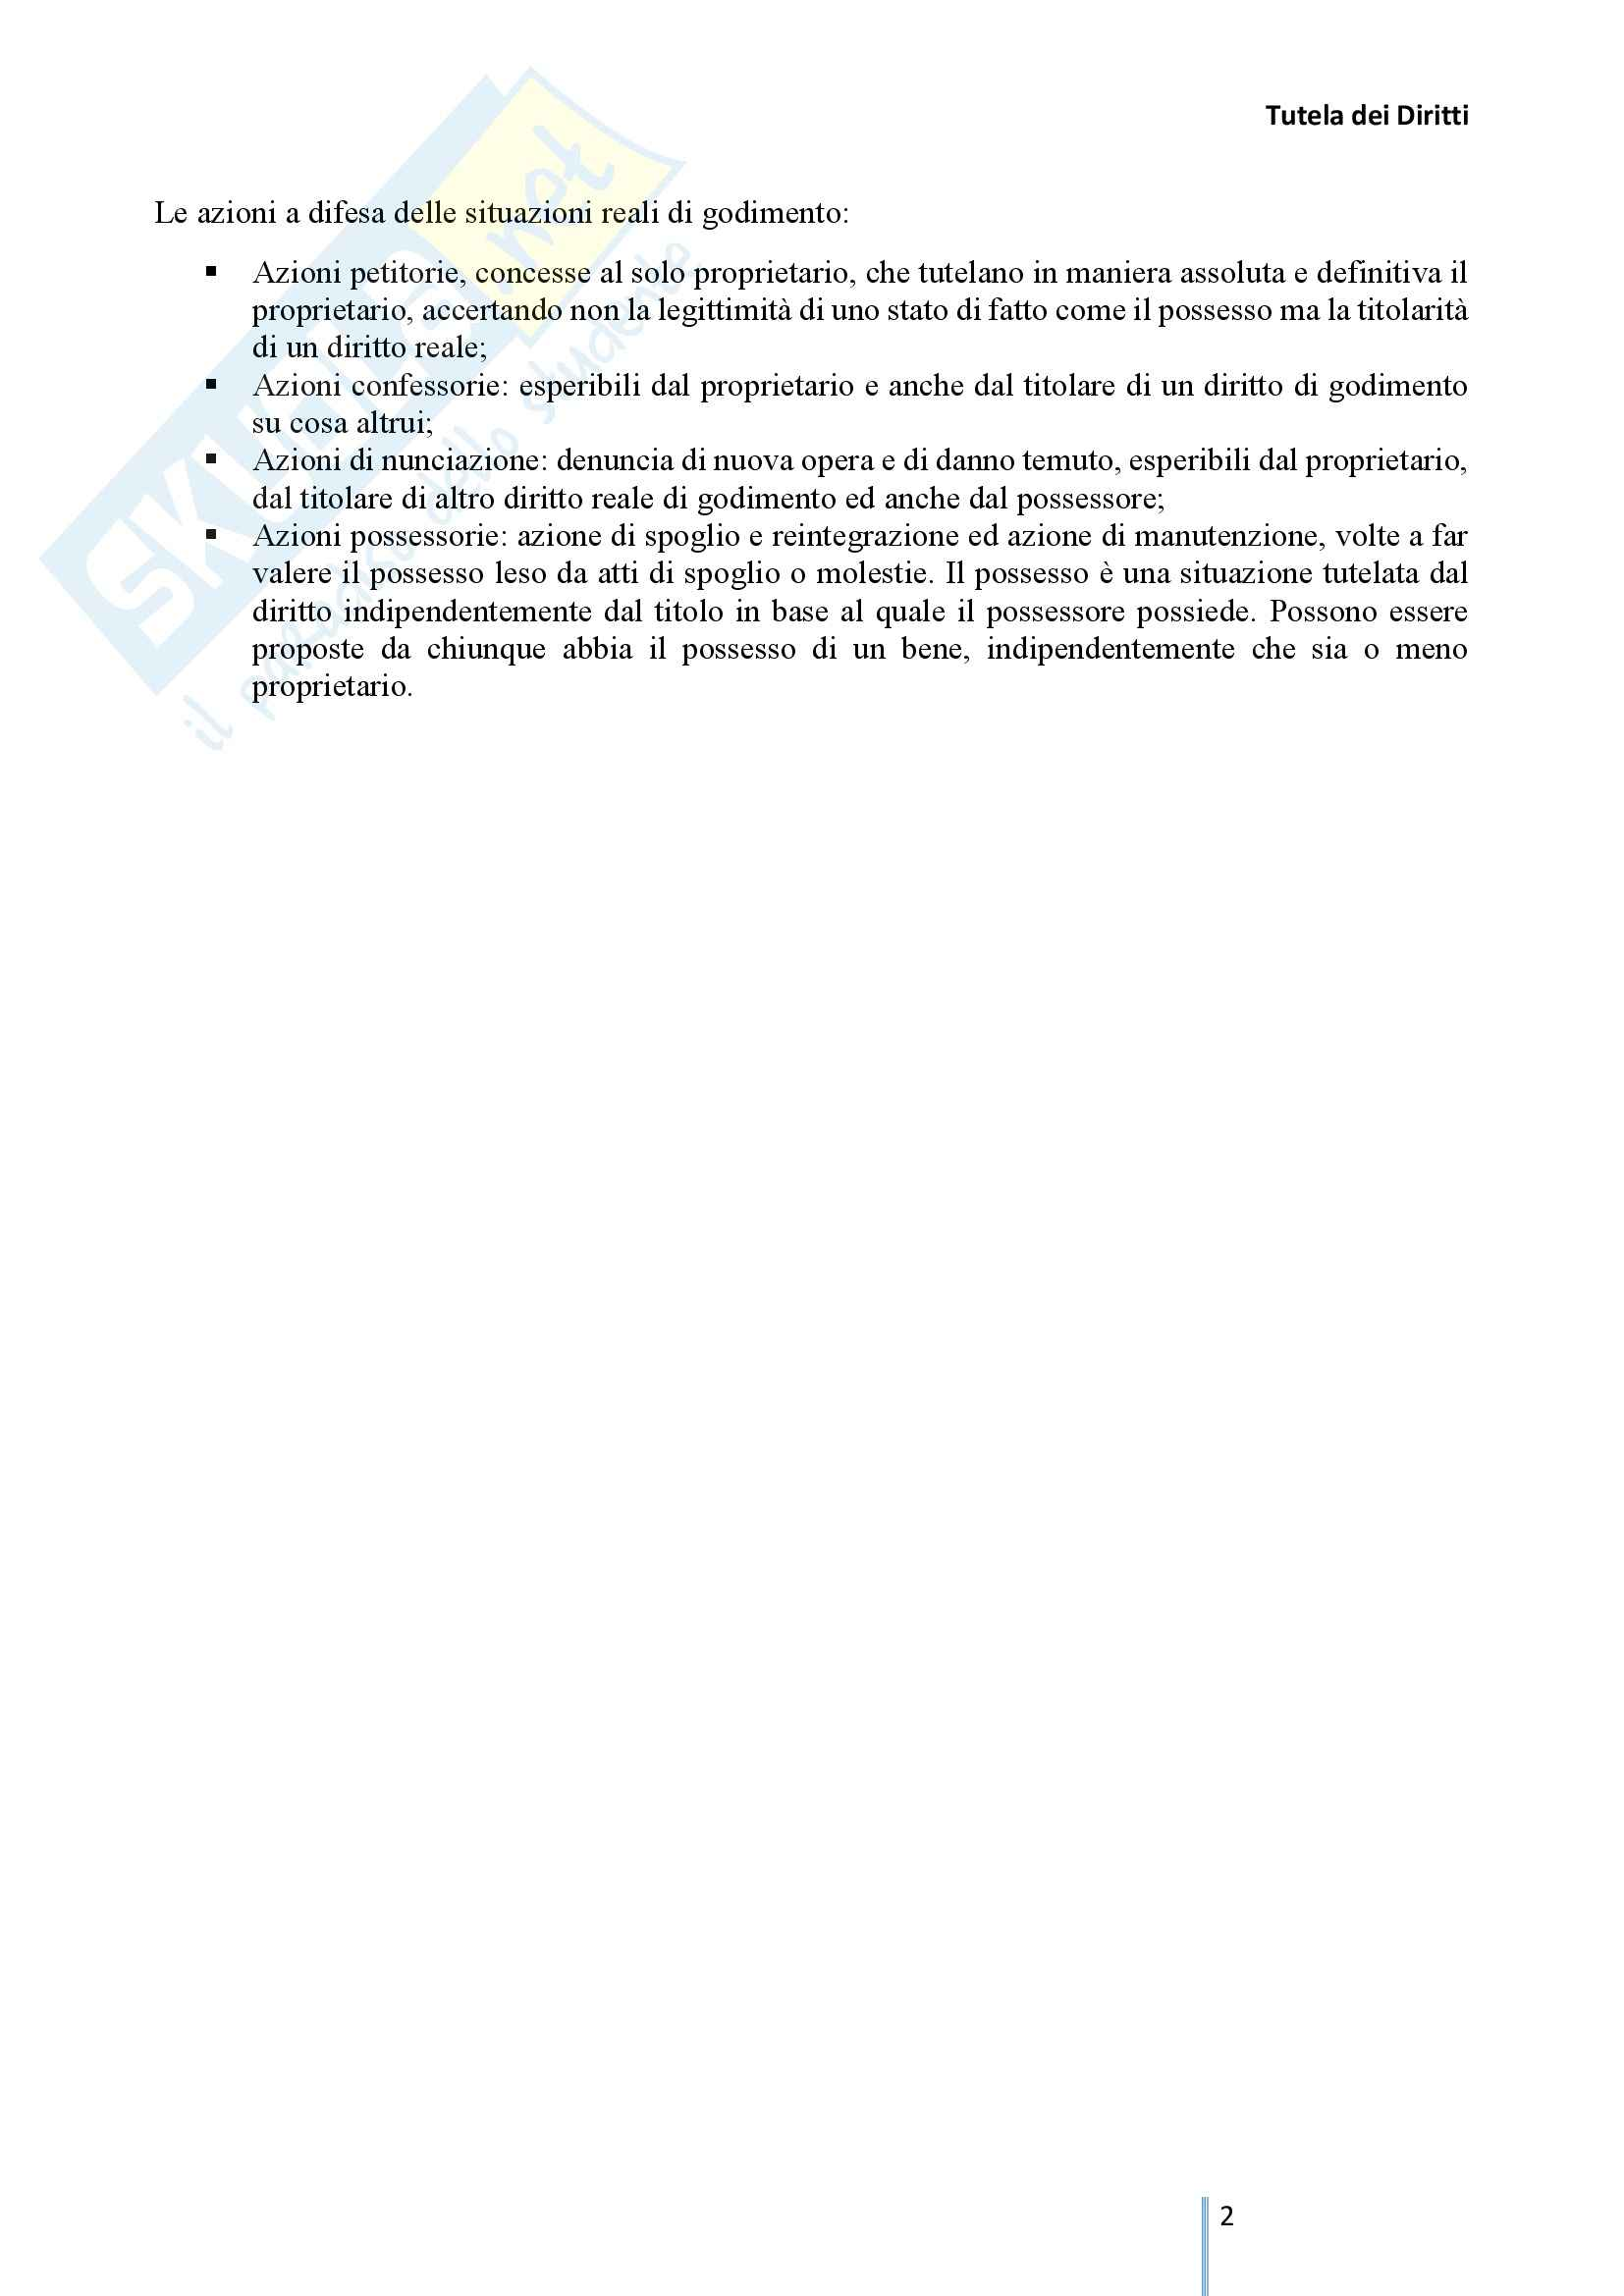 Riassunto esame Tutela dei diritti, prof. Cuffaro, libro consigliato Tutela dei Diritti, Cuffaro Pag. 2